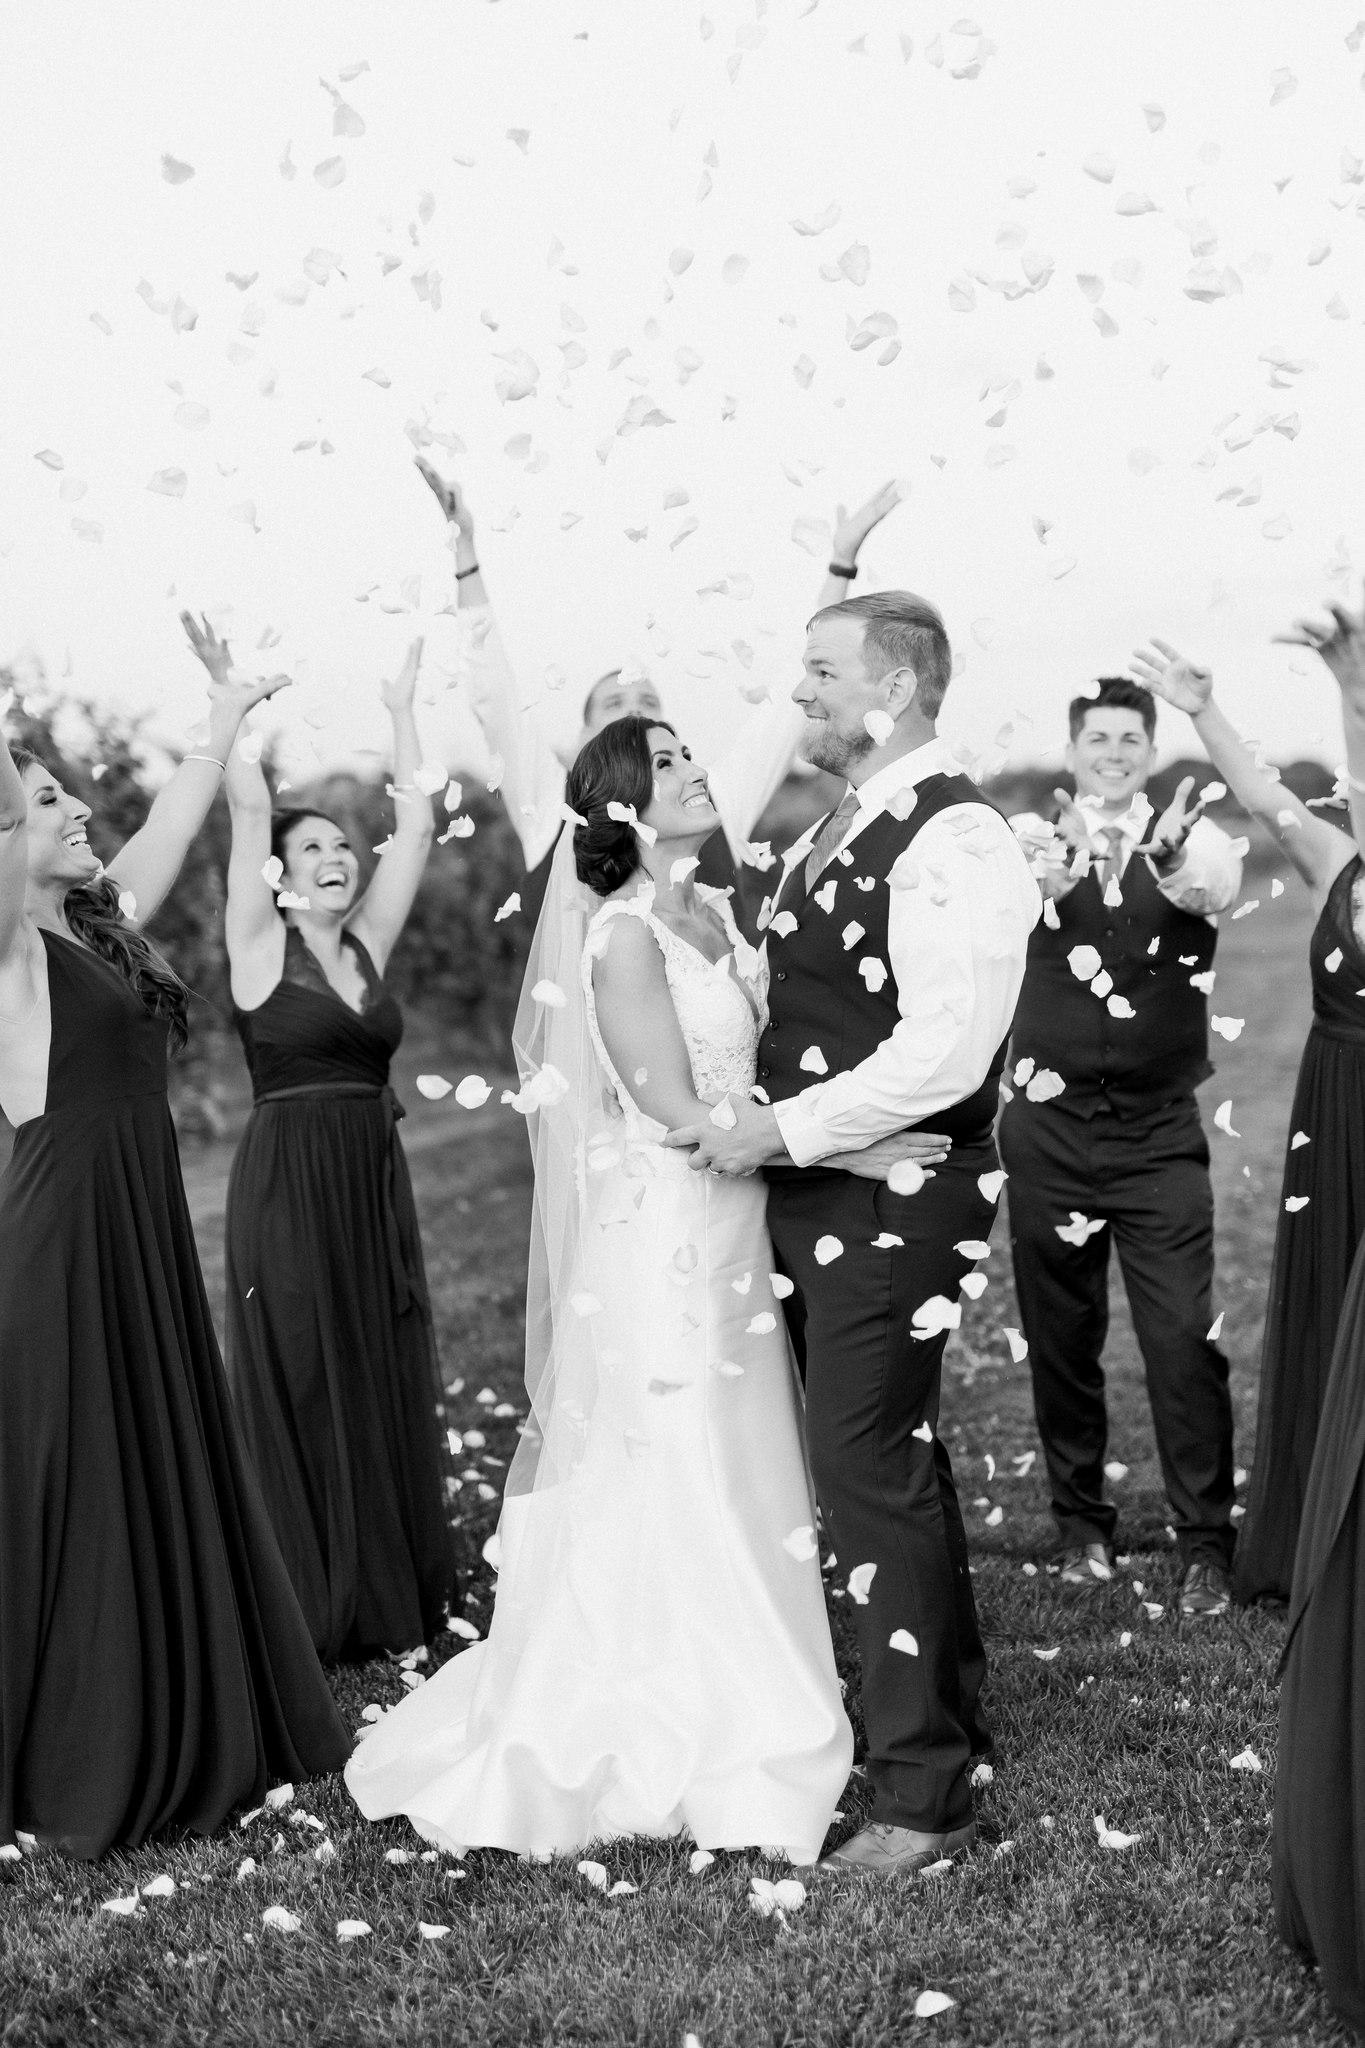 saltwater farm wedding_bridal bouquets_ct wedding_ct wedding photographer-1.jpg